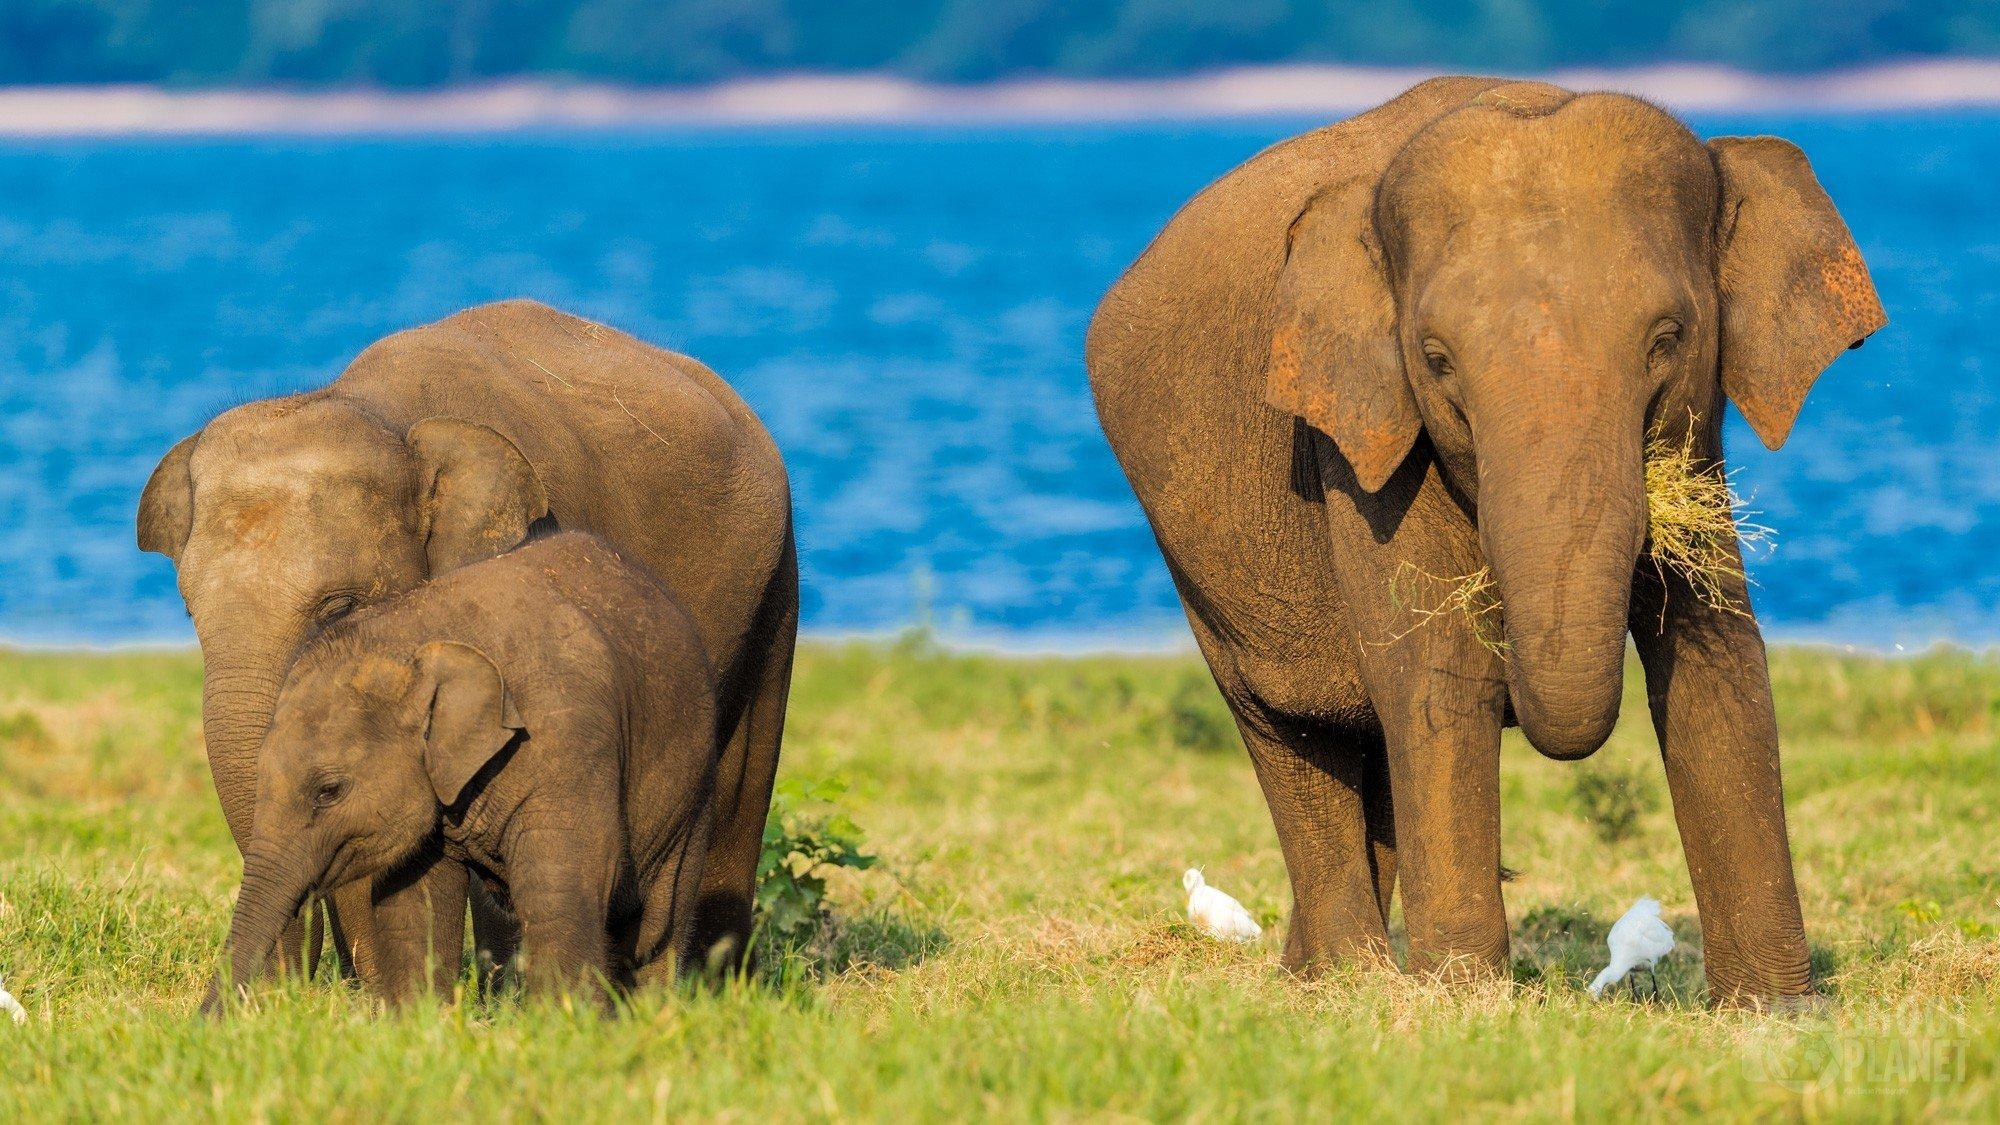 Elephants in Minneriya National Park Sri Lanka